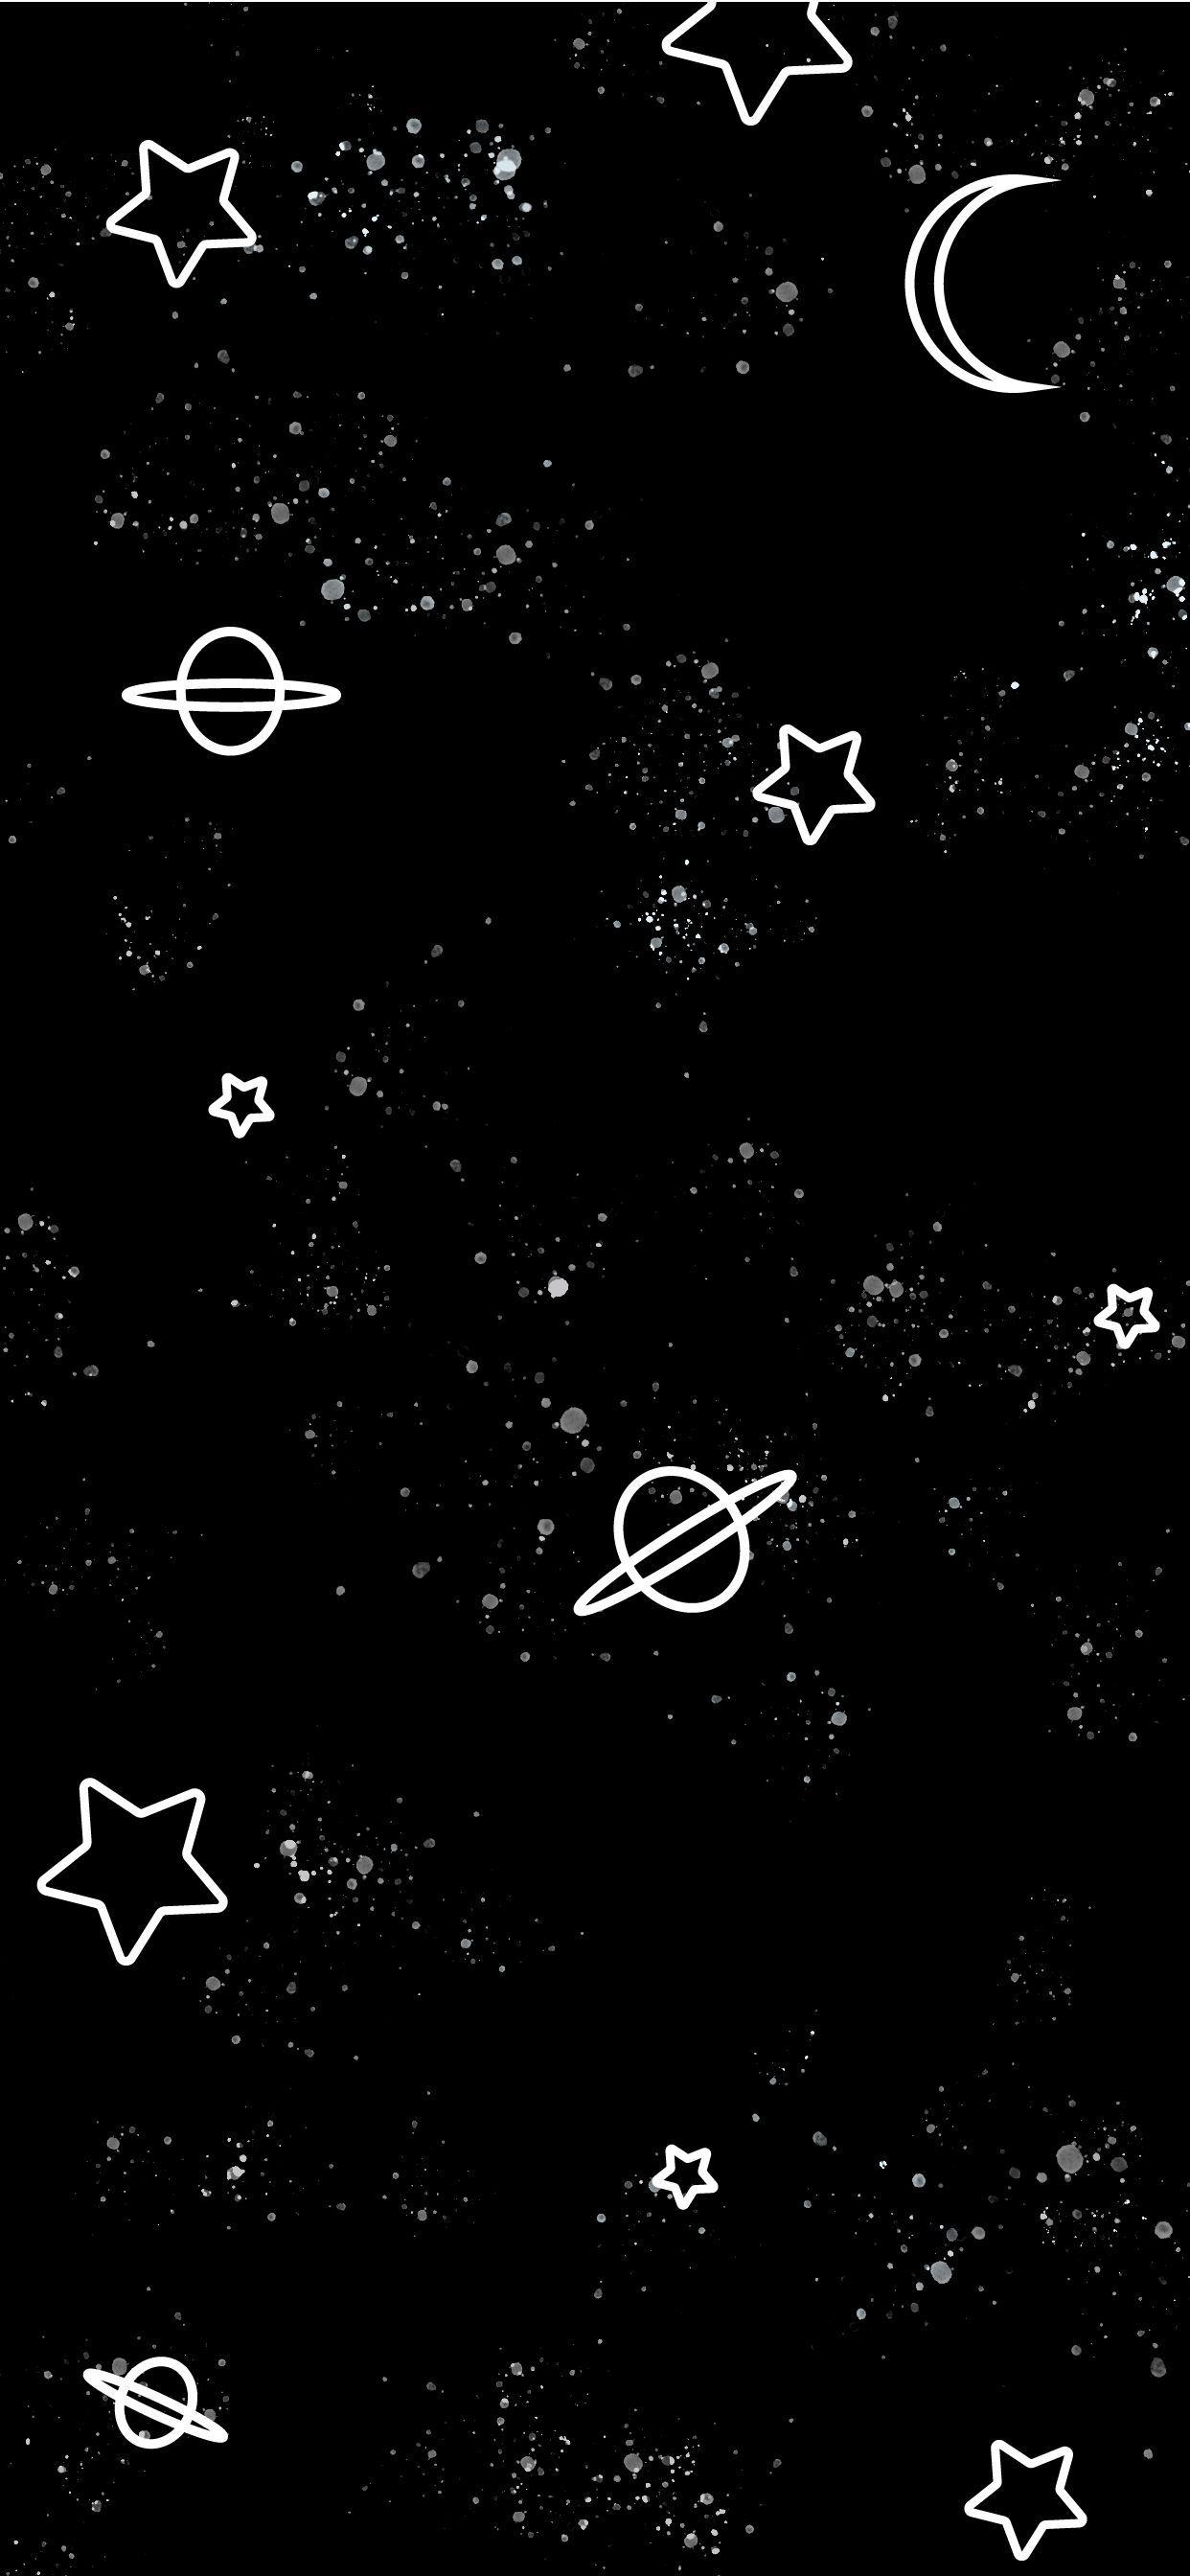 Black Cute iPhone Wallpapers - Wallpaper Cave